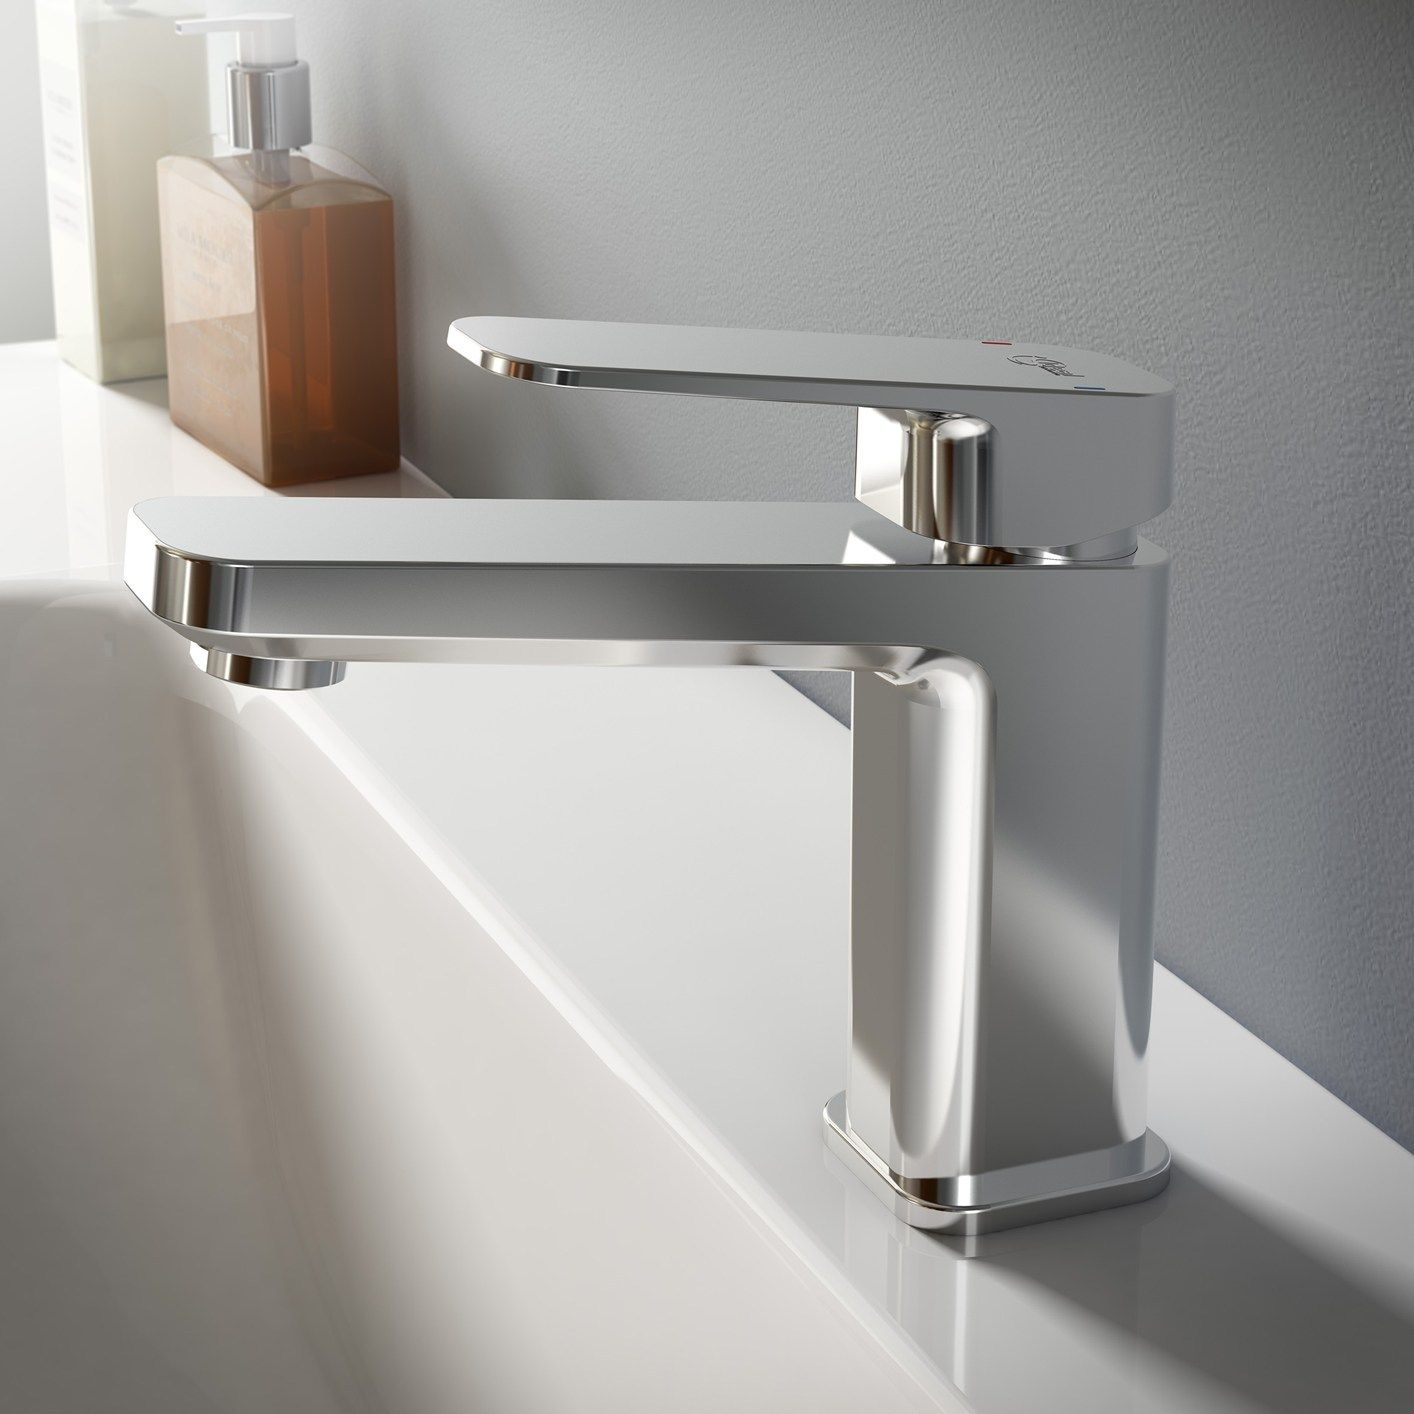 geometrie morbide e funzionali per tonic ii by ideal standard. Black Bedroom Furniture Sets. Home Design Ideas